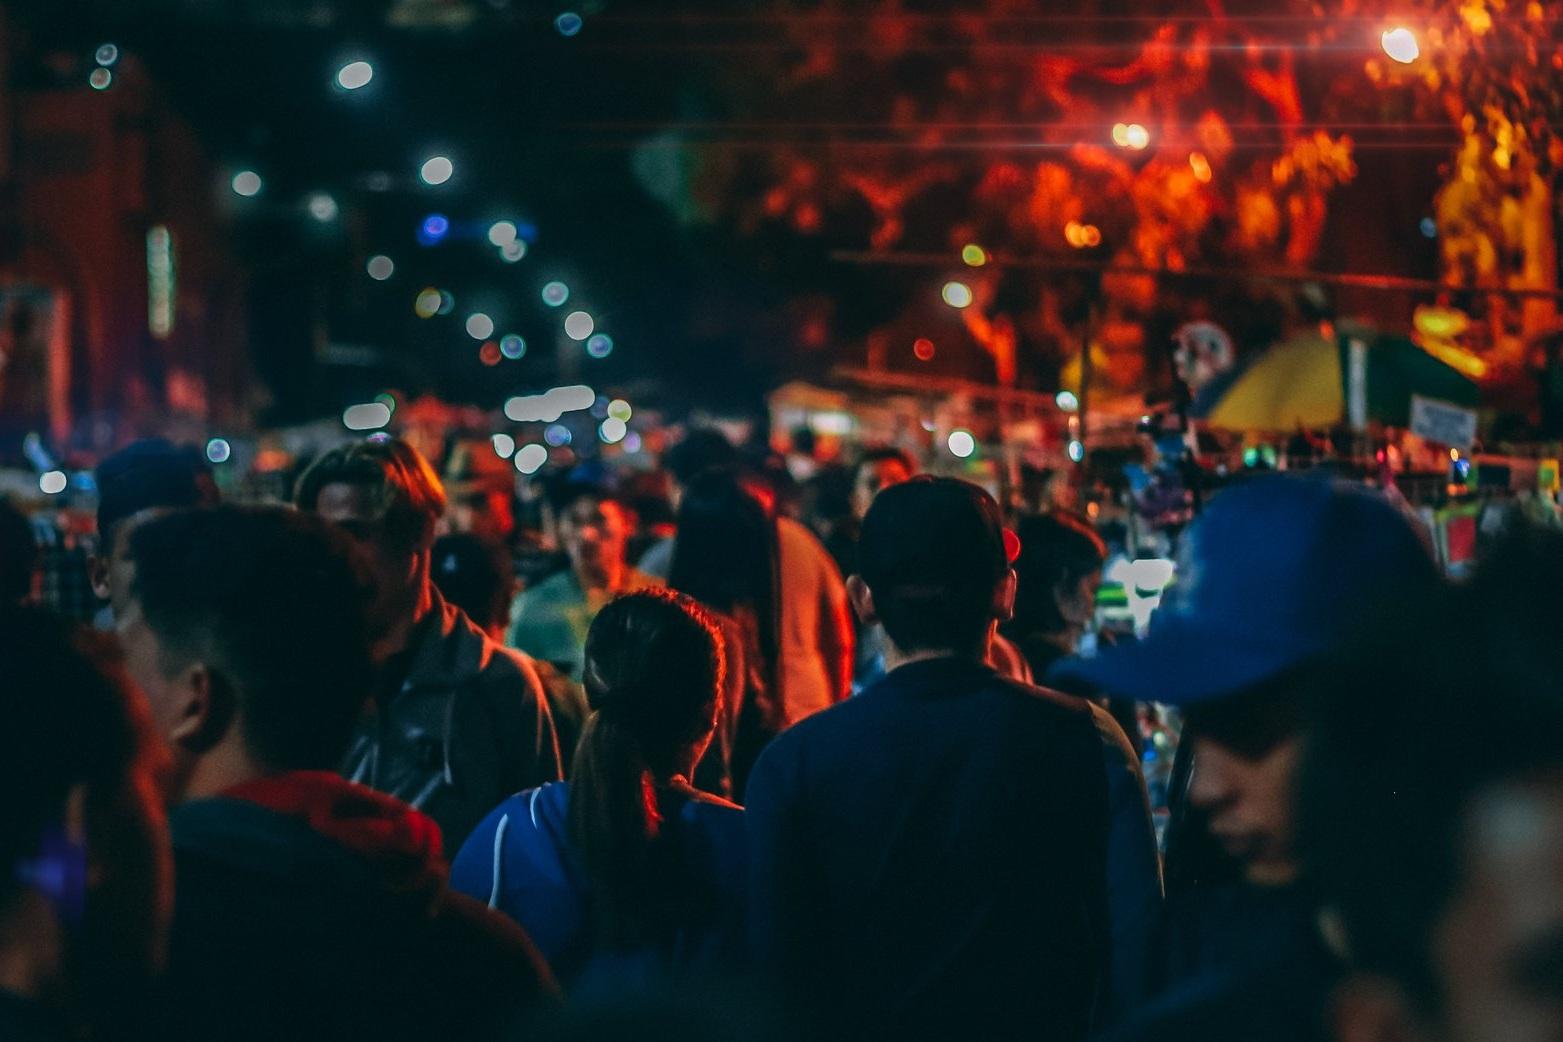 blur-busy-street-city-life-1472334.jpg